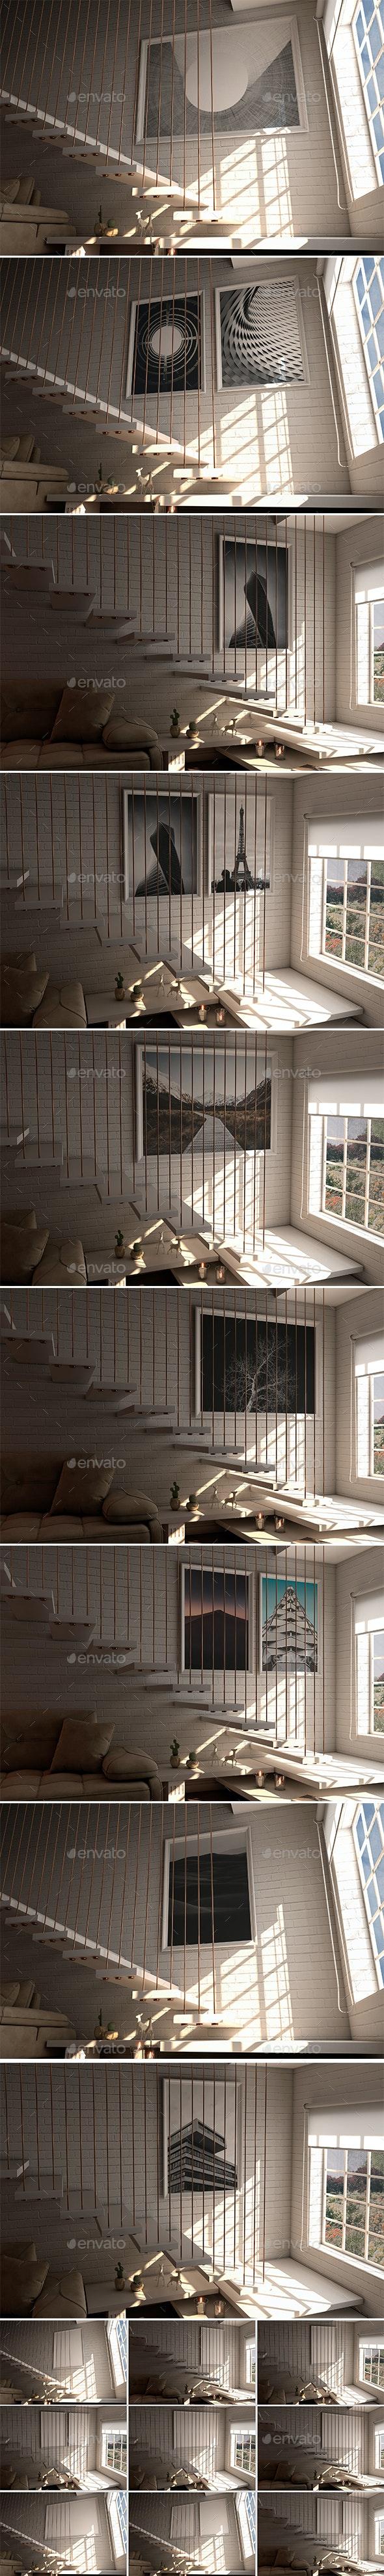 Indoor House Photorealistic MockUps - Product Mock-Ups Graphics